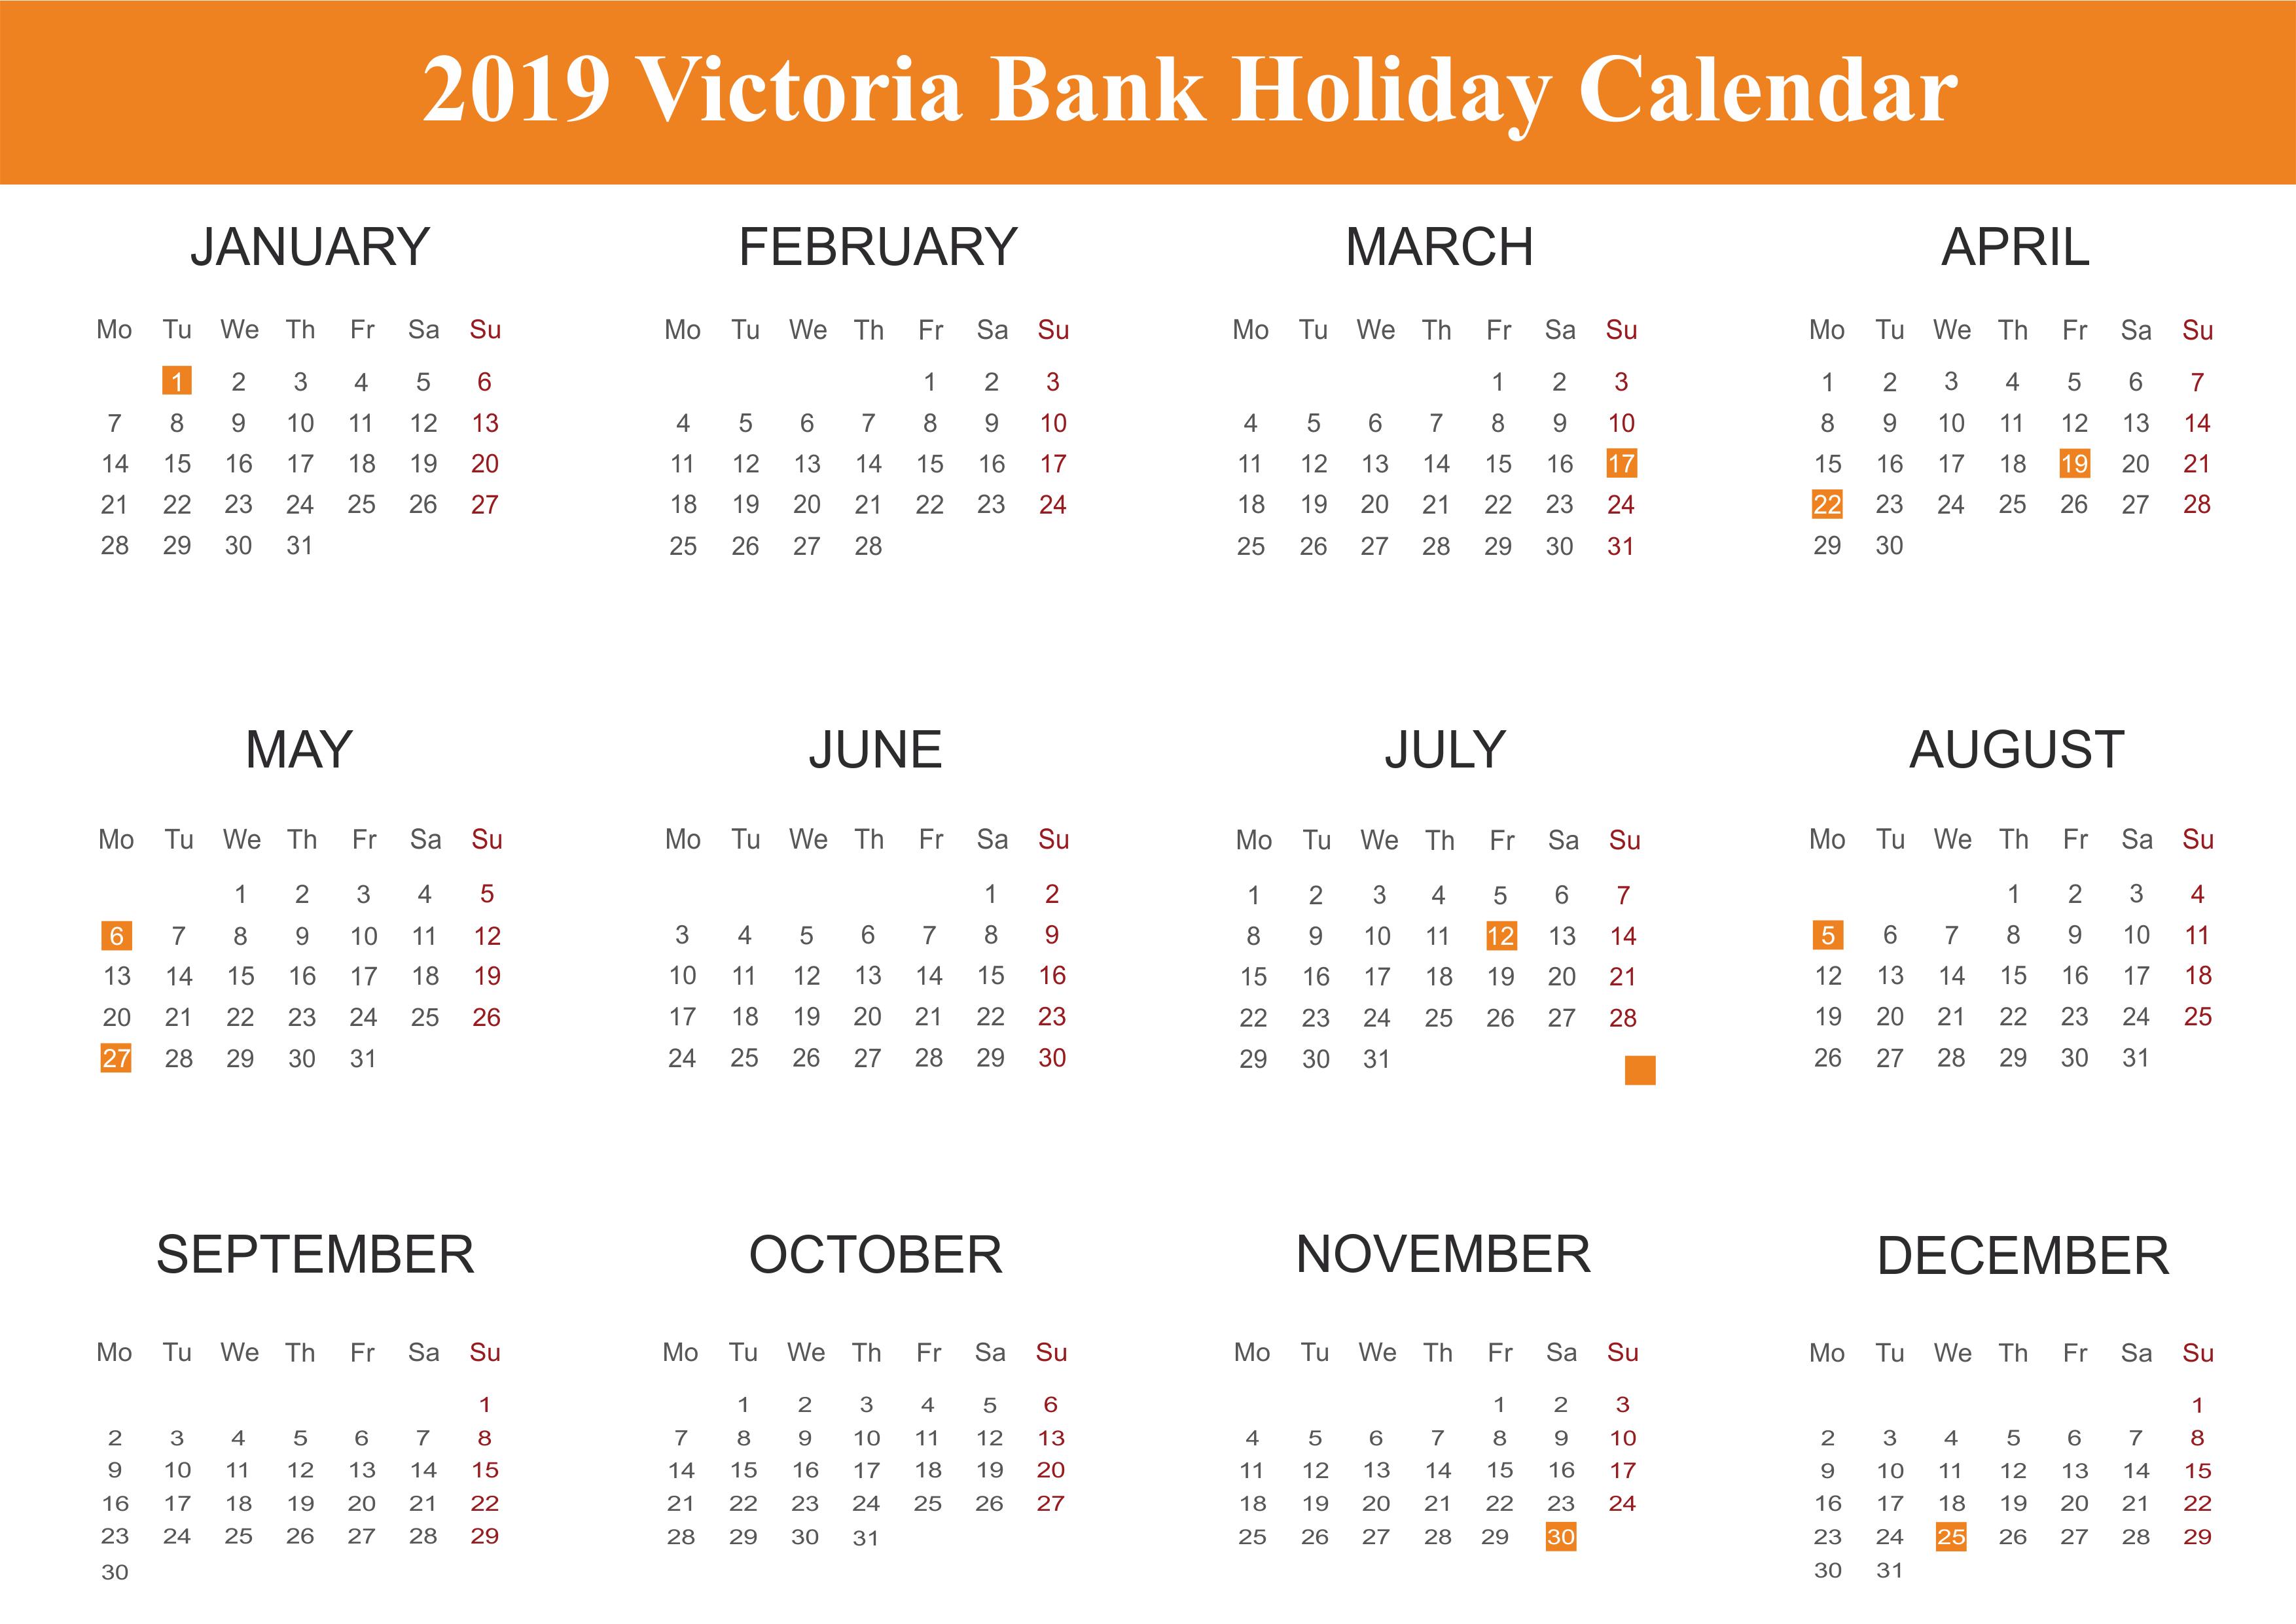 2019 Victoria Bank Holidays Calendar